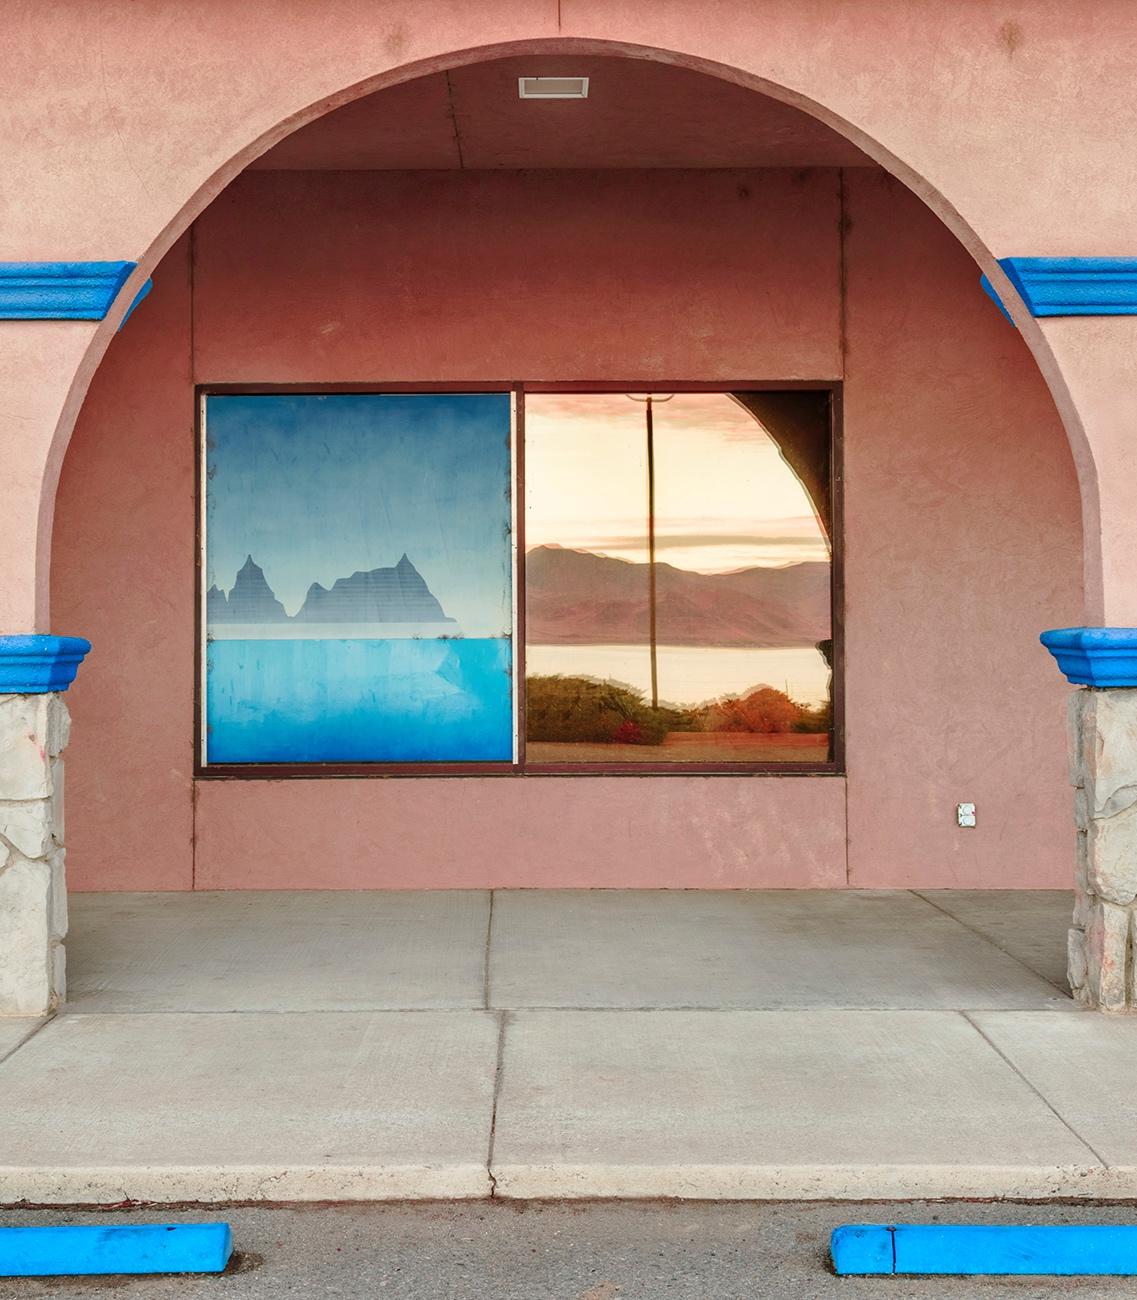 Pyramid+Lake+in+Window%2C+Nevada.jpg